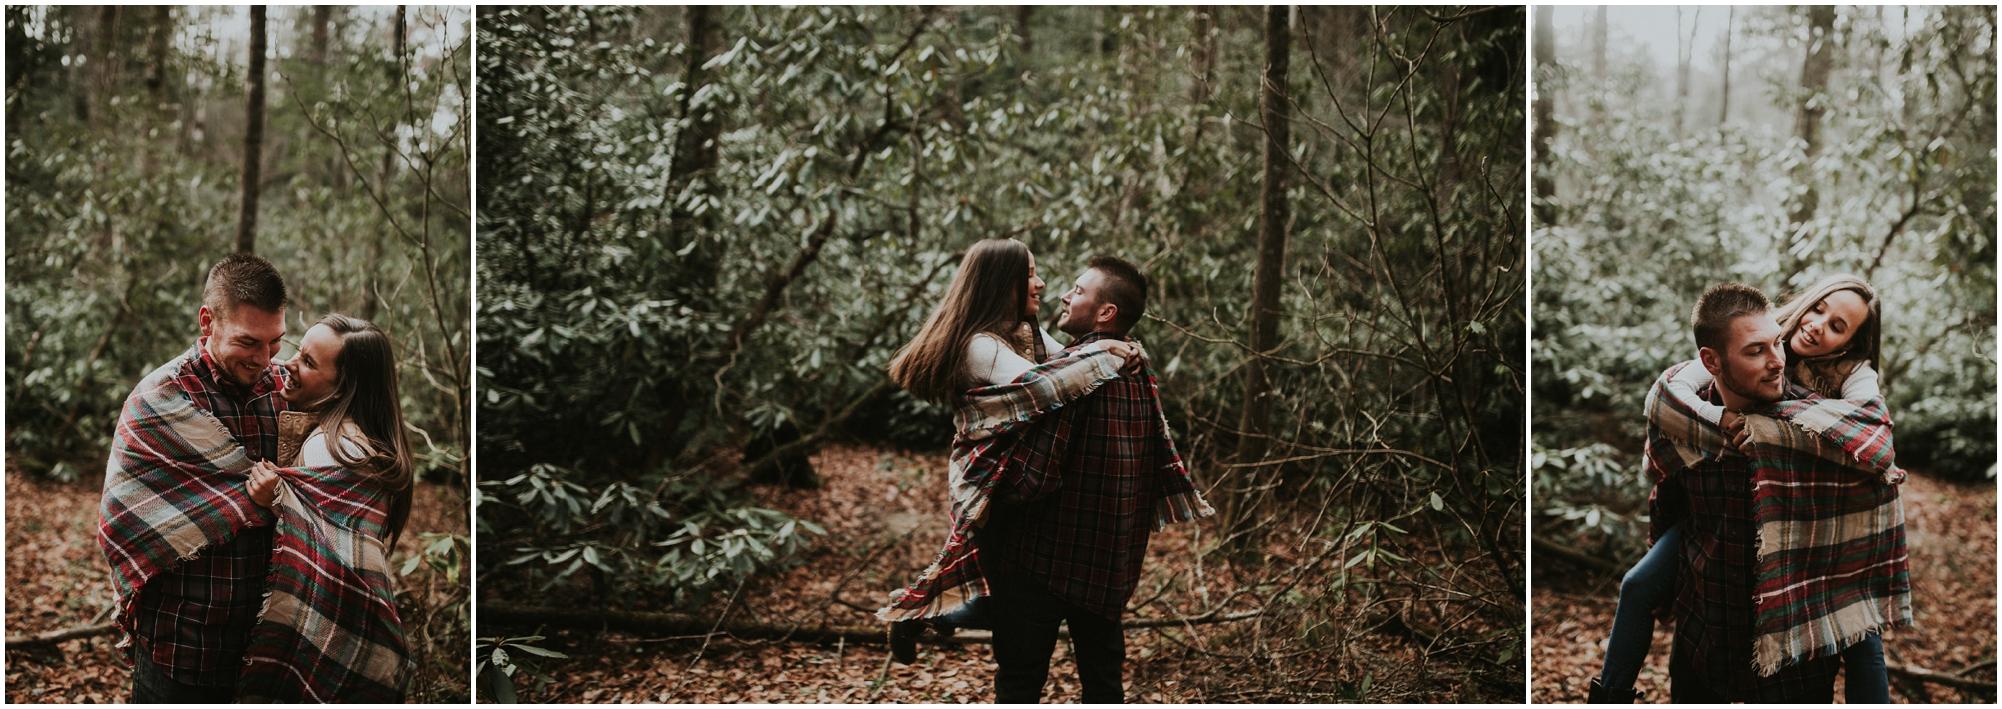 Linville-Falls-Engagement-avonne-Photography-85.jpg